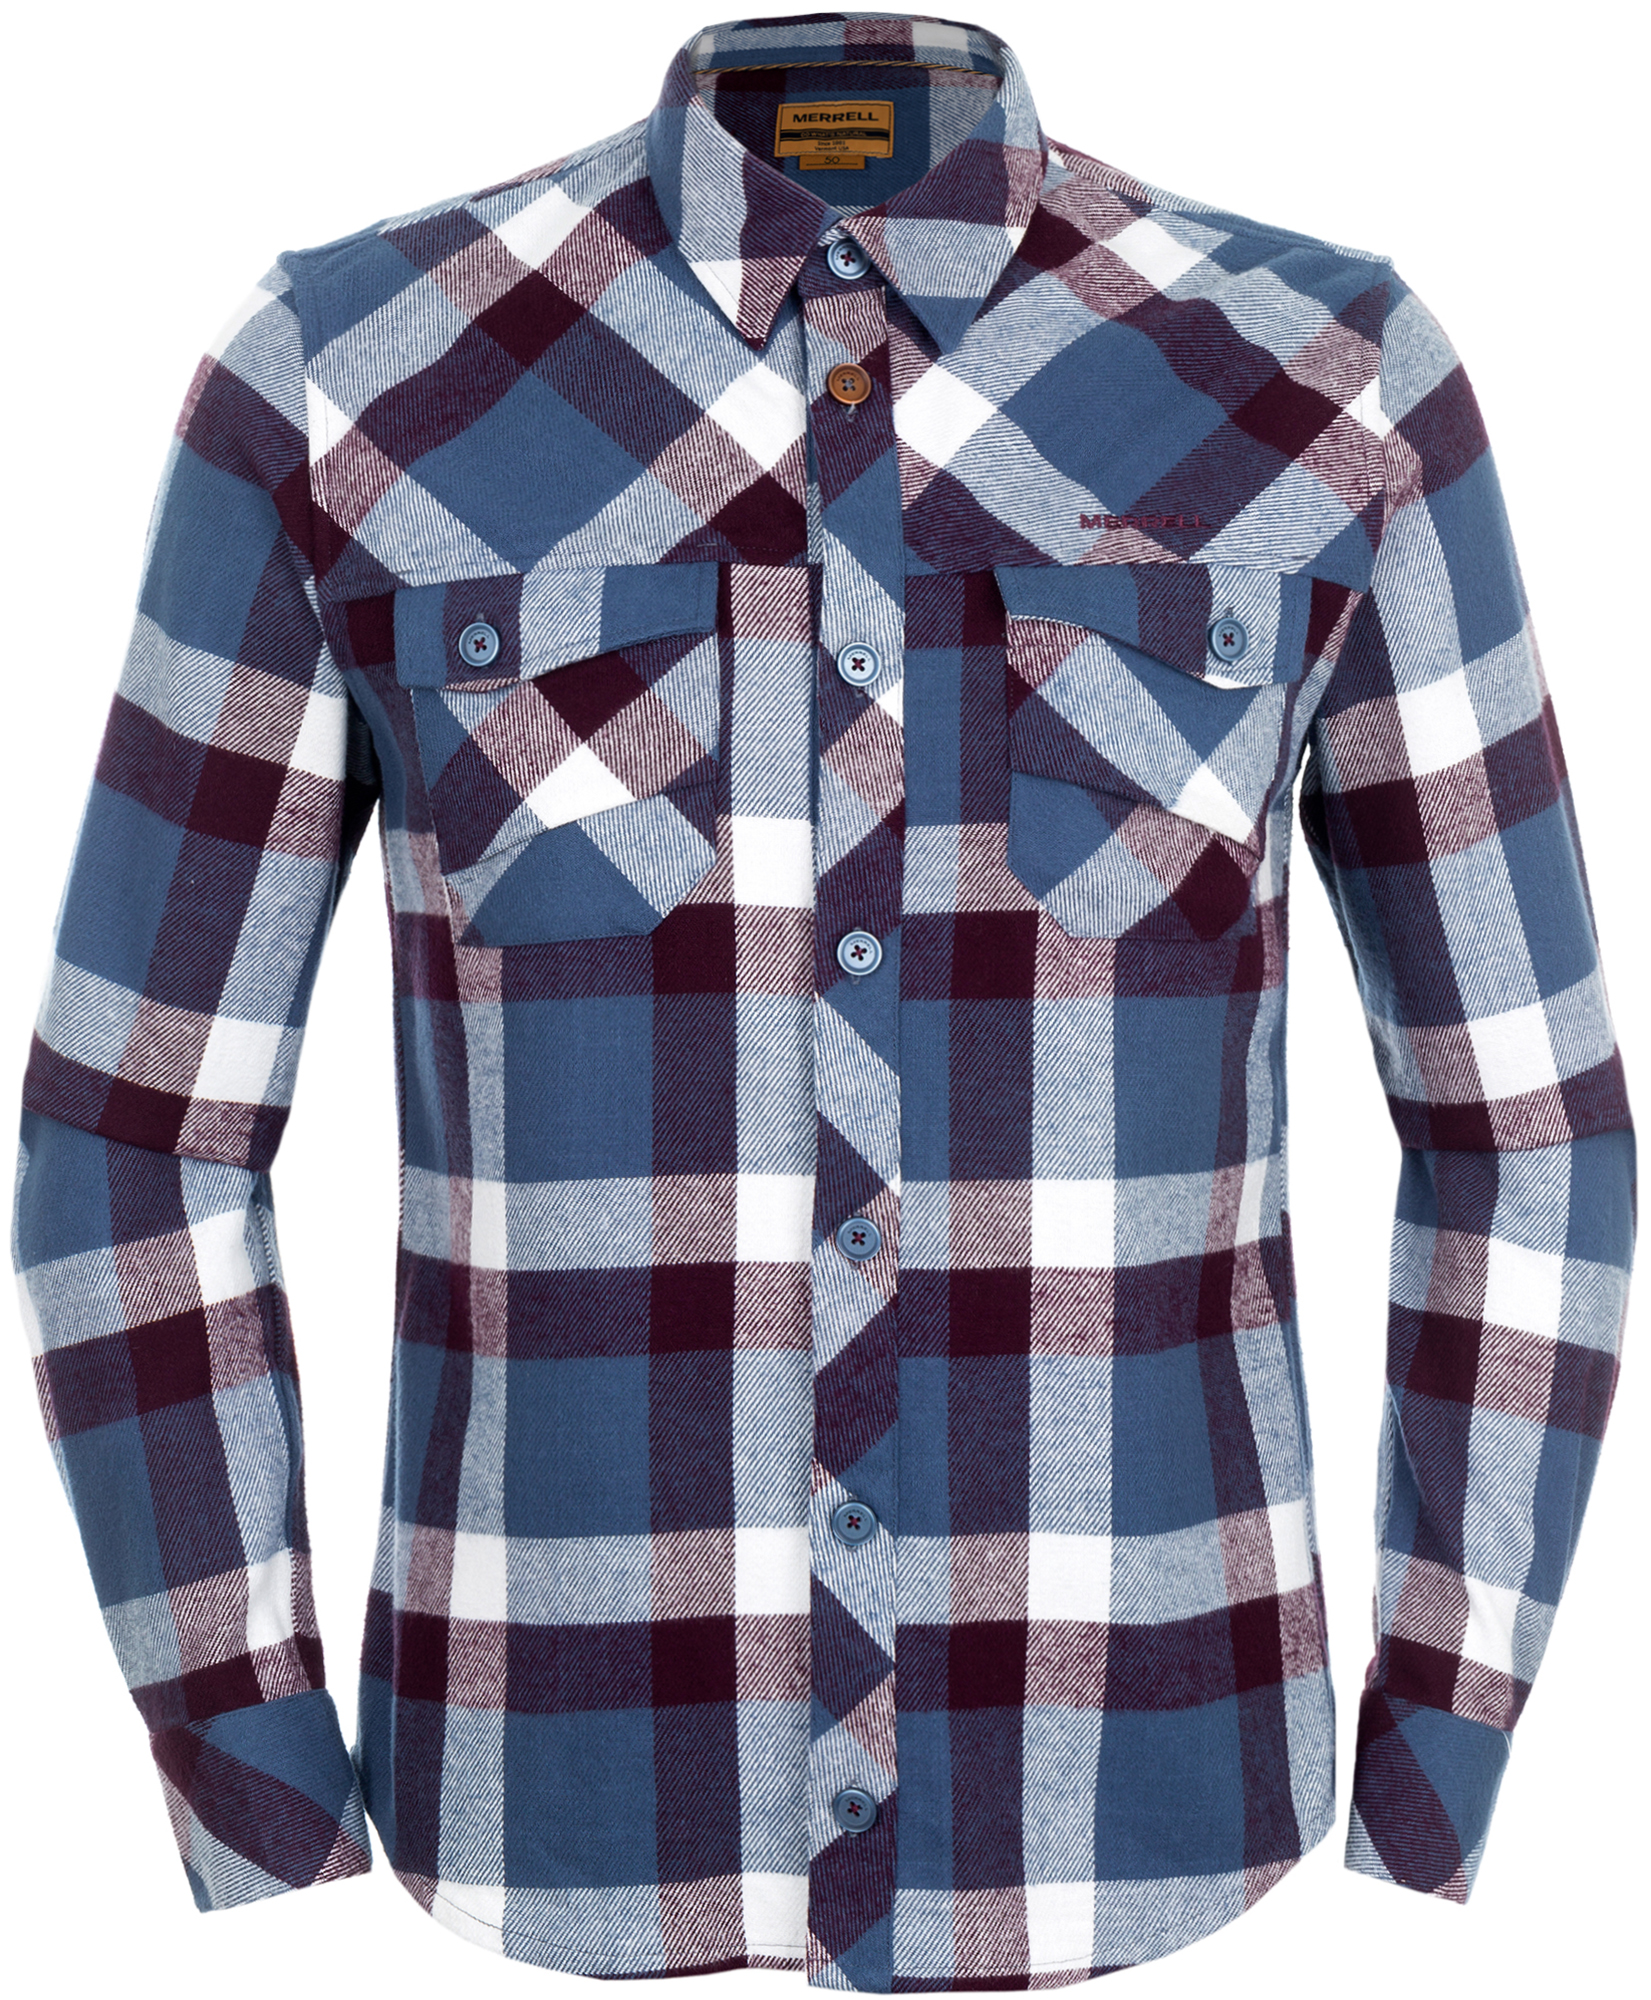 Merrell Рубашка с длинным рукавом мужская Merrell Germania рубашка мужская gap 142643 349